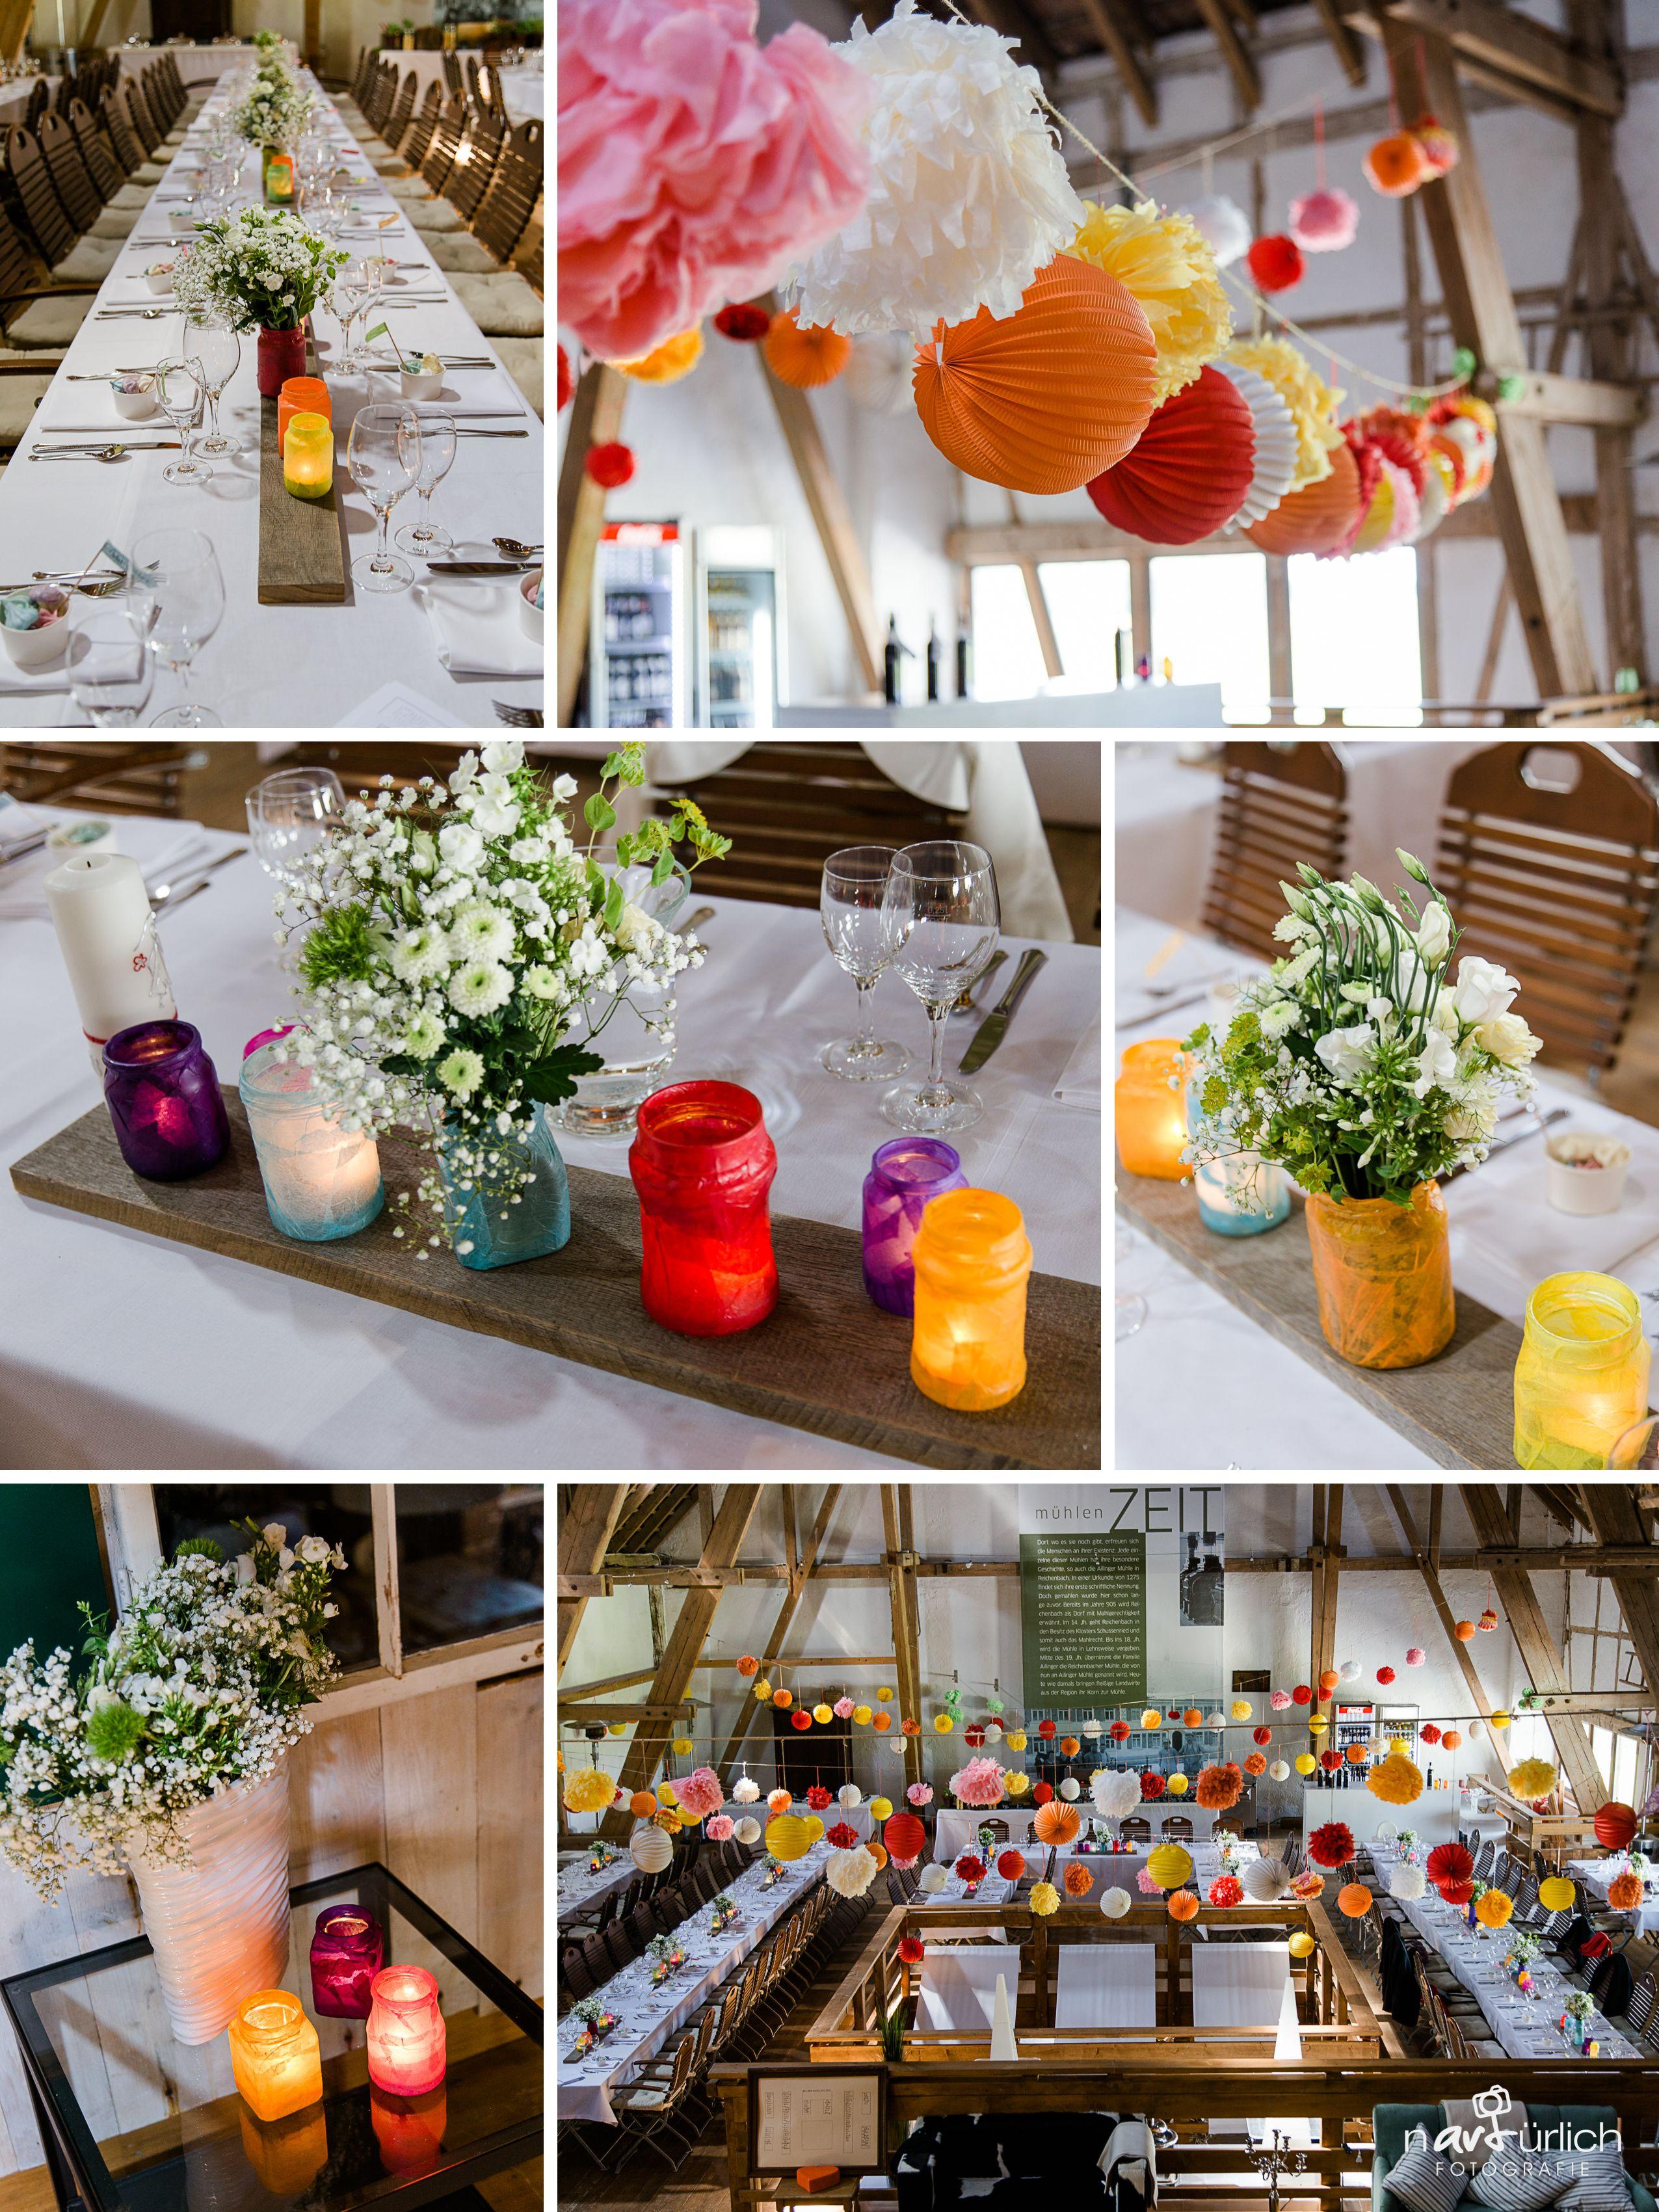 wedding decoration vintage scheune deko wedding. Black Bedroom Furniture Sets. Home Design Ideas